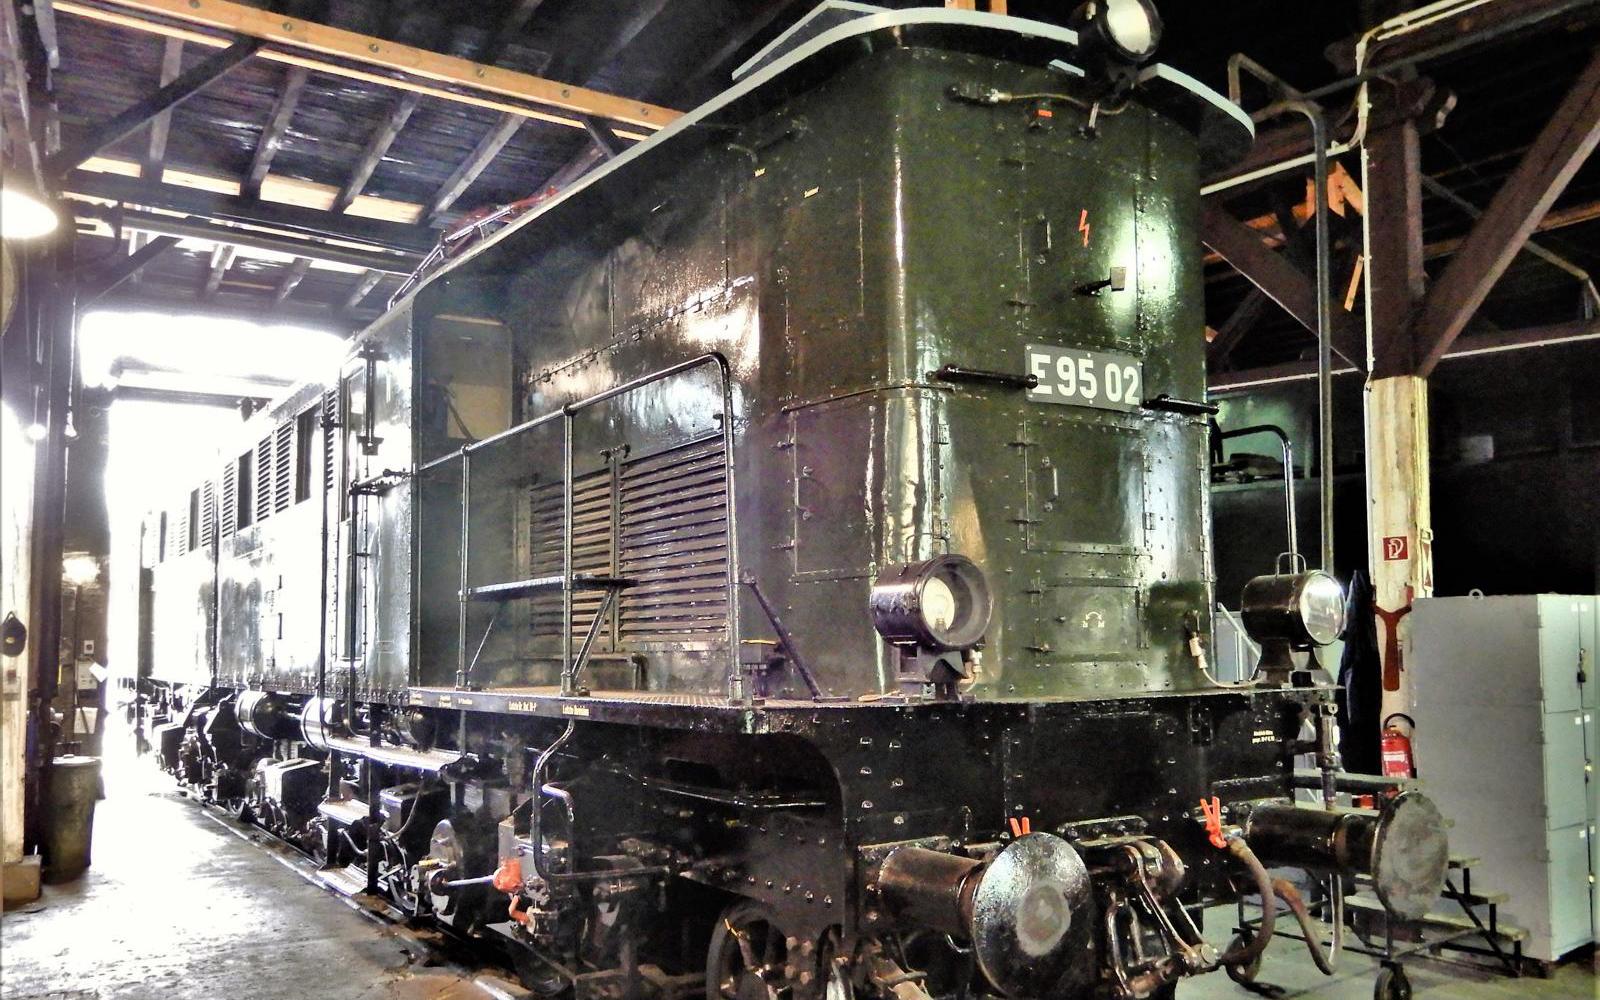 ©Foto: Christian Wodzinski   railmen   Im Lokschuppen des DB Museums Halle   Güterzuglokomotive E95 02